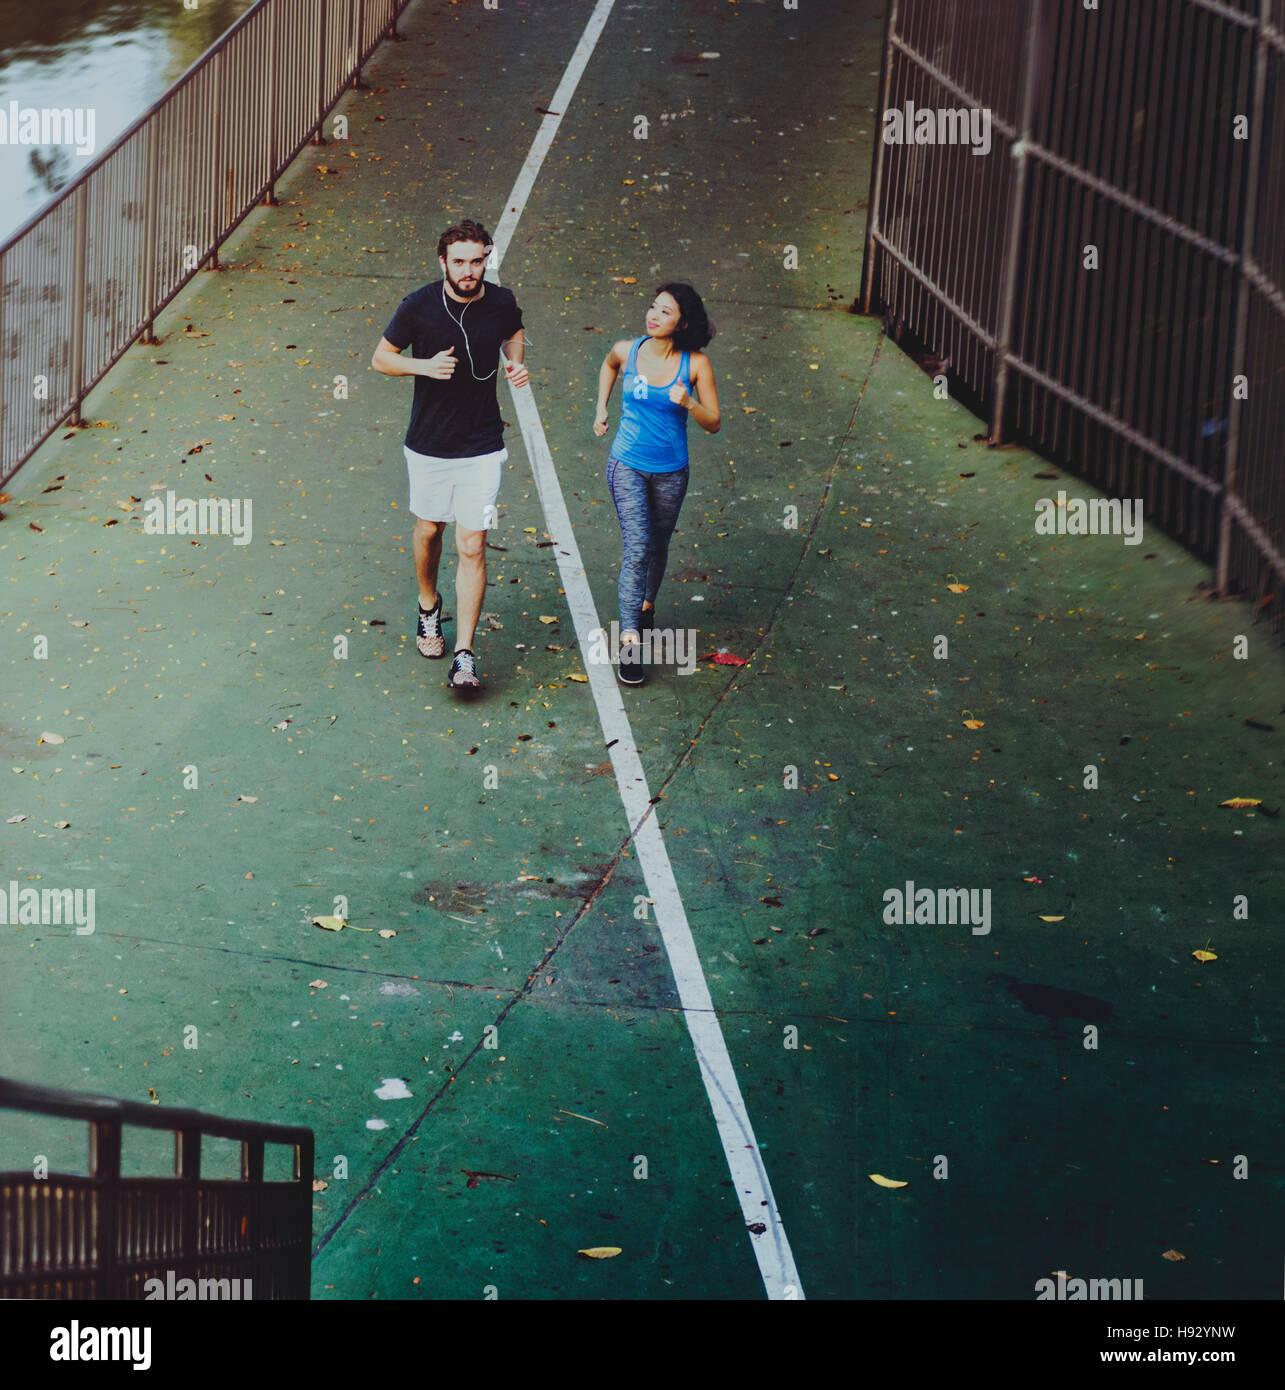 Paar attraktive Athlet Lifestyle-Sport-Training-Konzept Stockbild